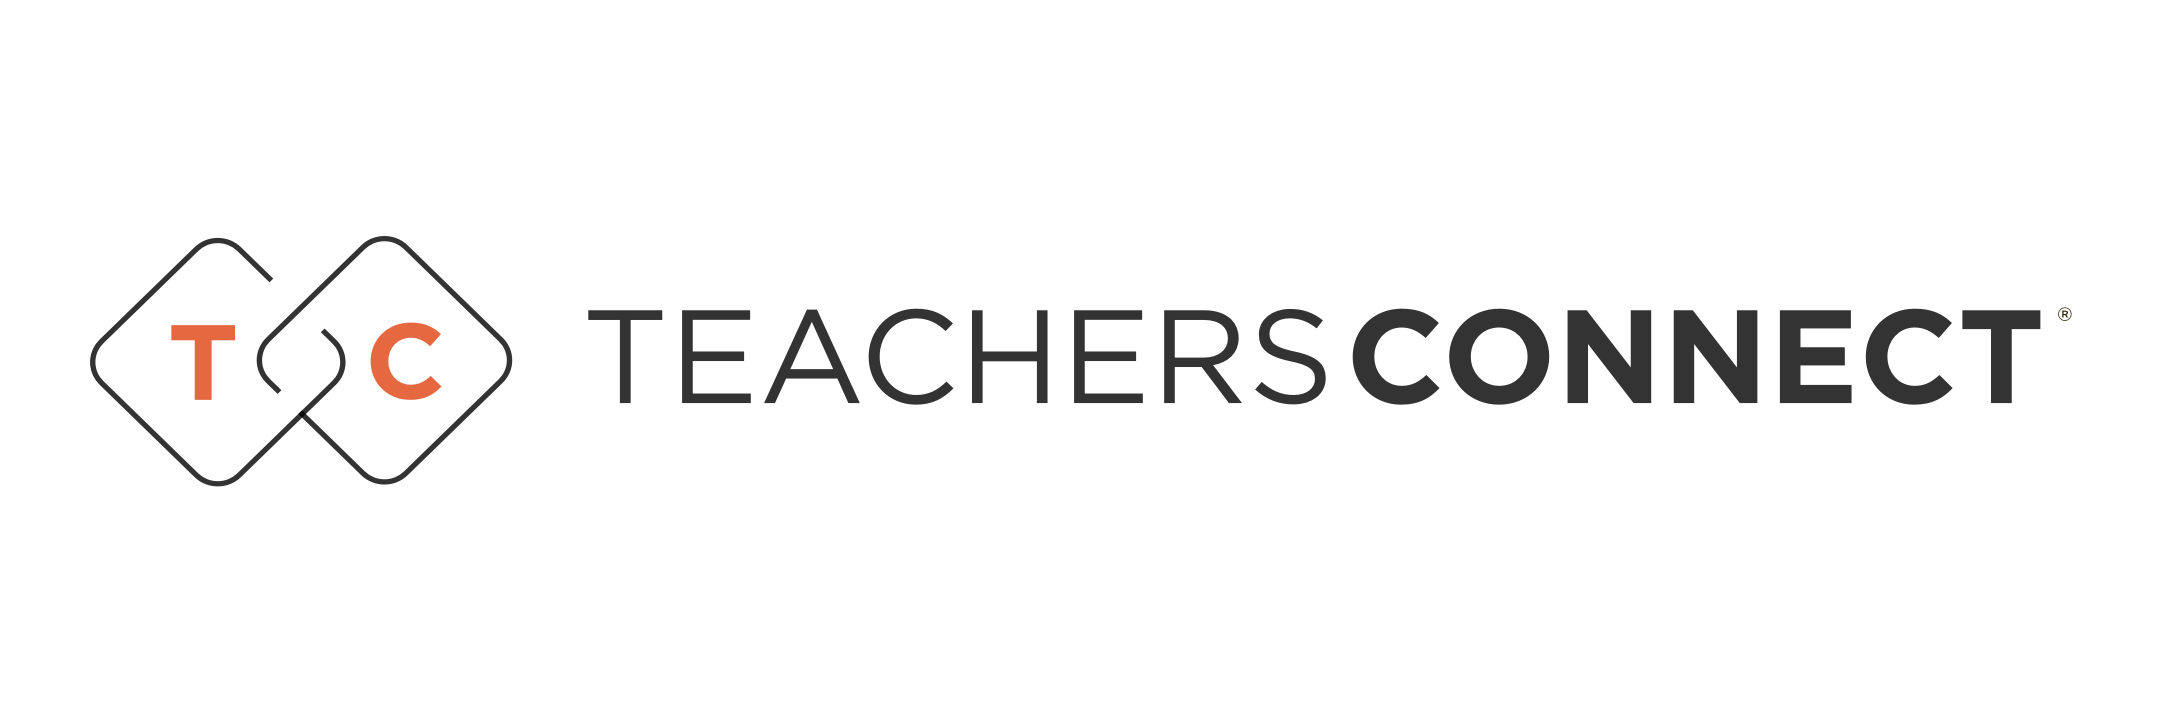 TeachersConnect company logo